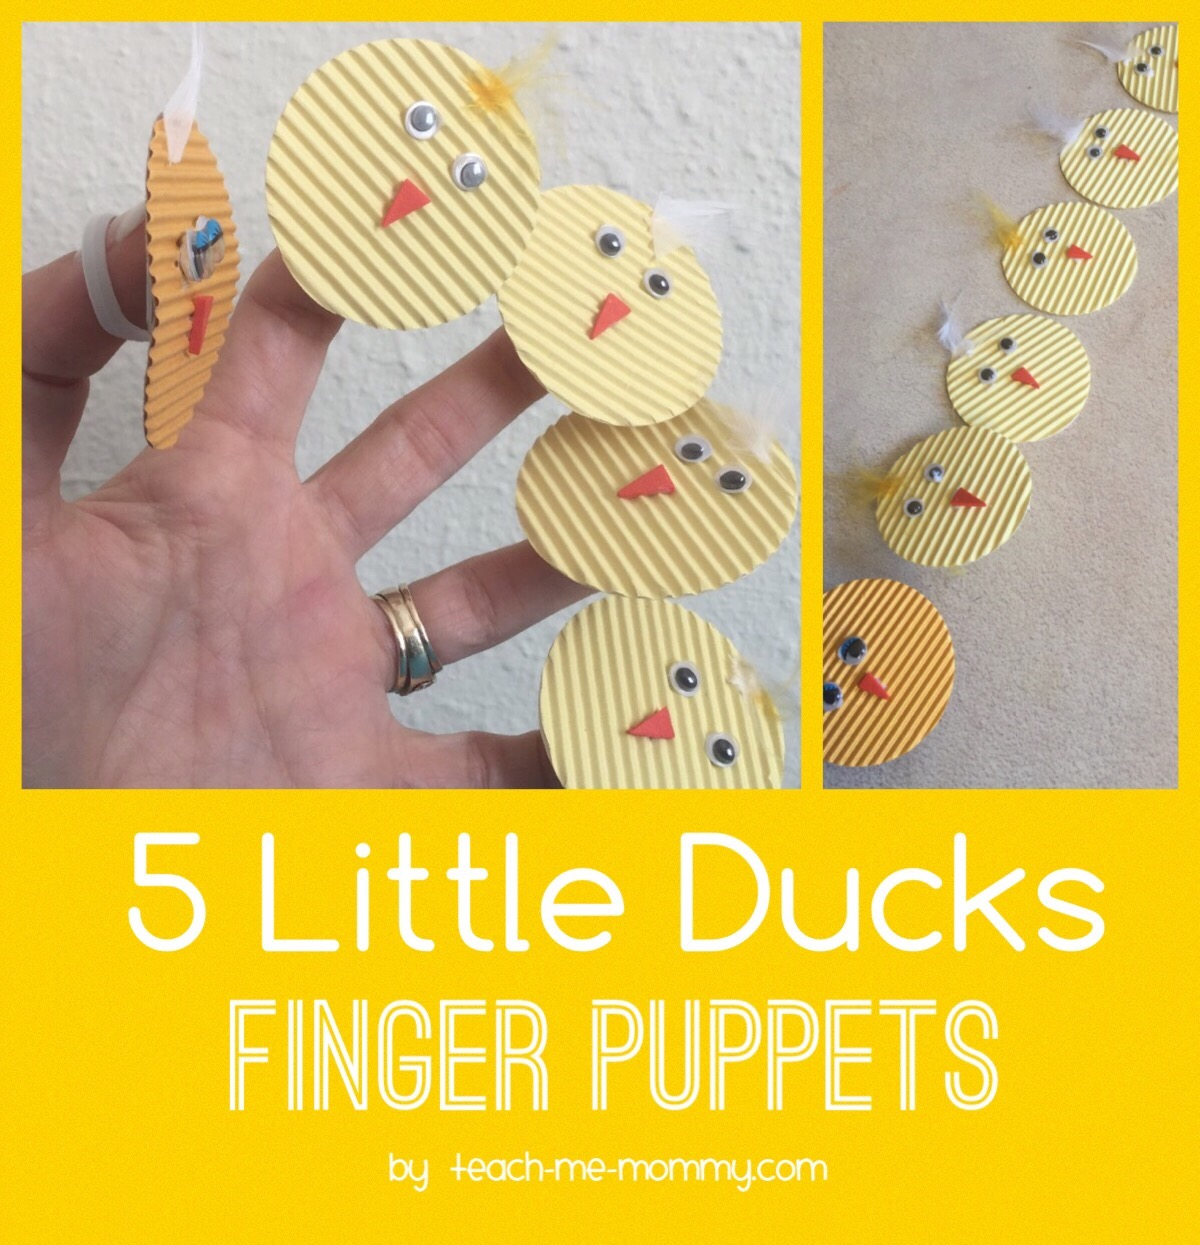 five little ducks, finger puppets